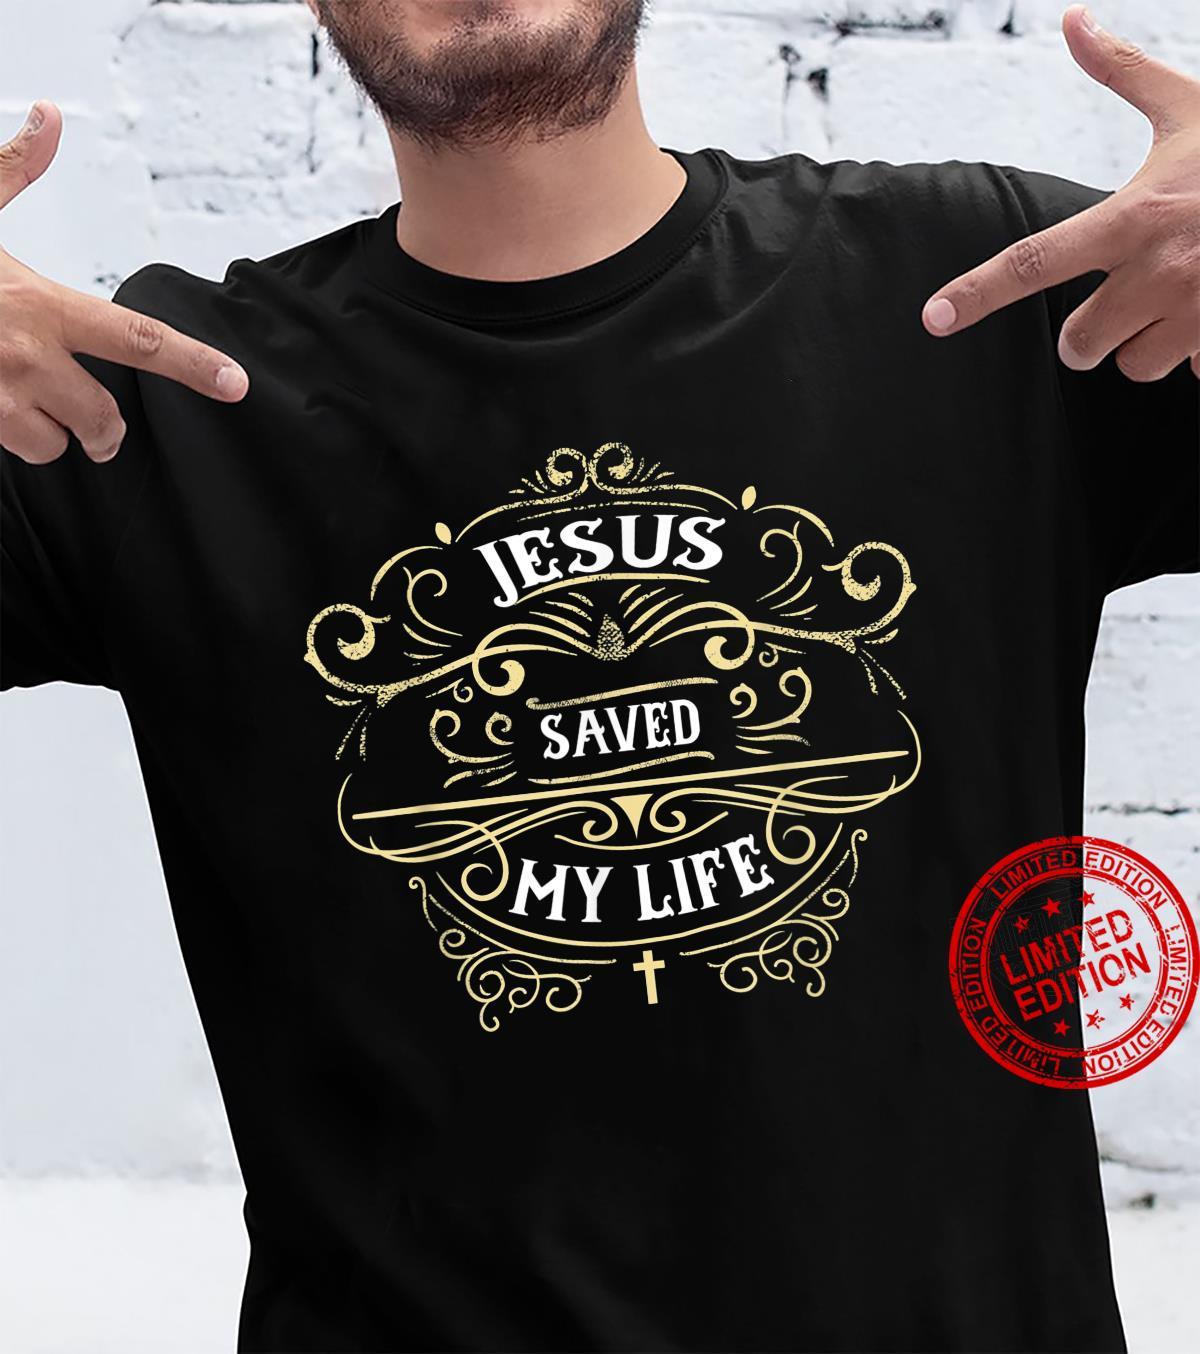 Retro Vintage Jesus Saved My Life Christian Shirt